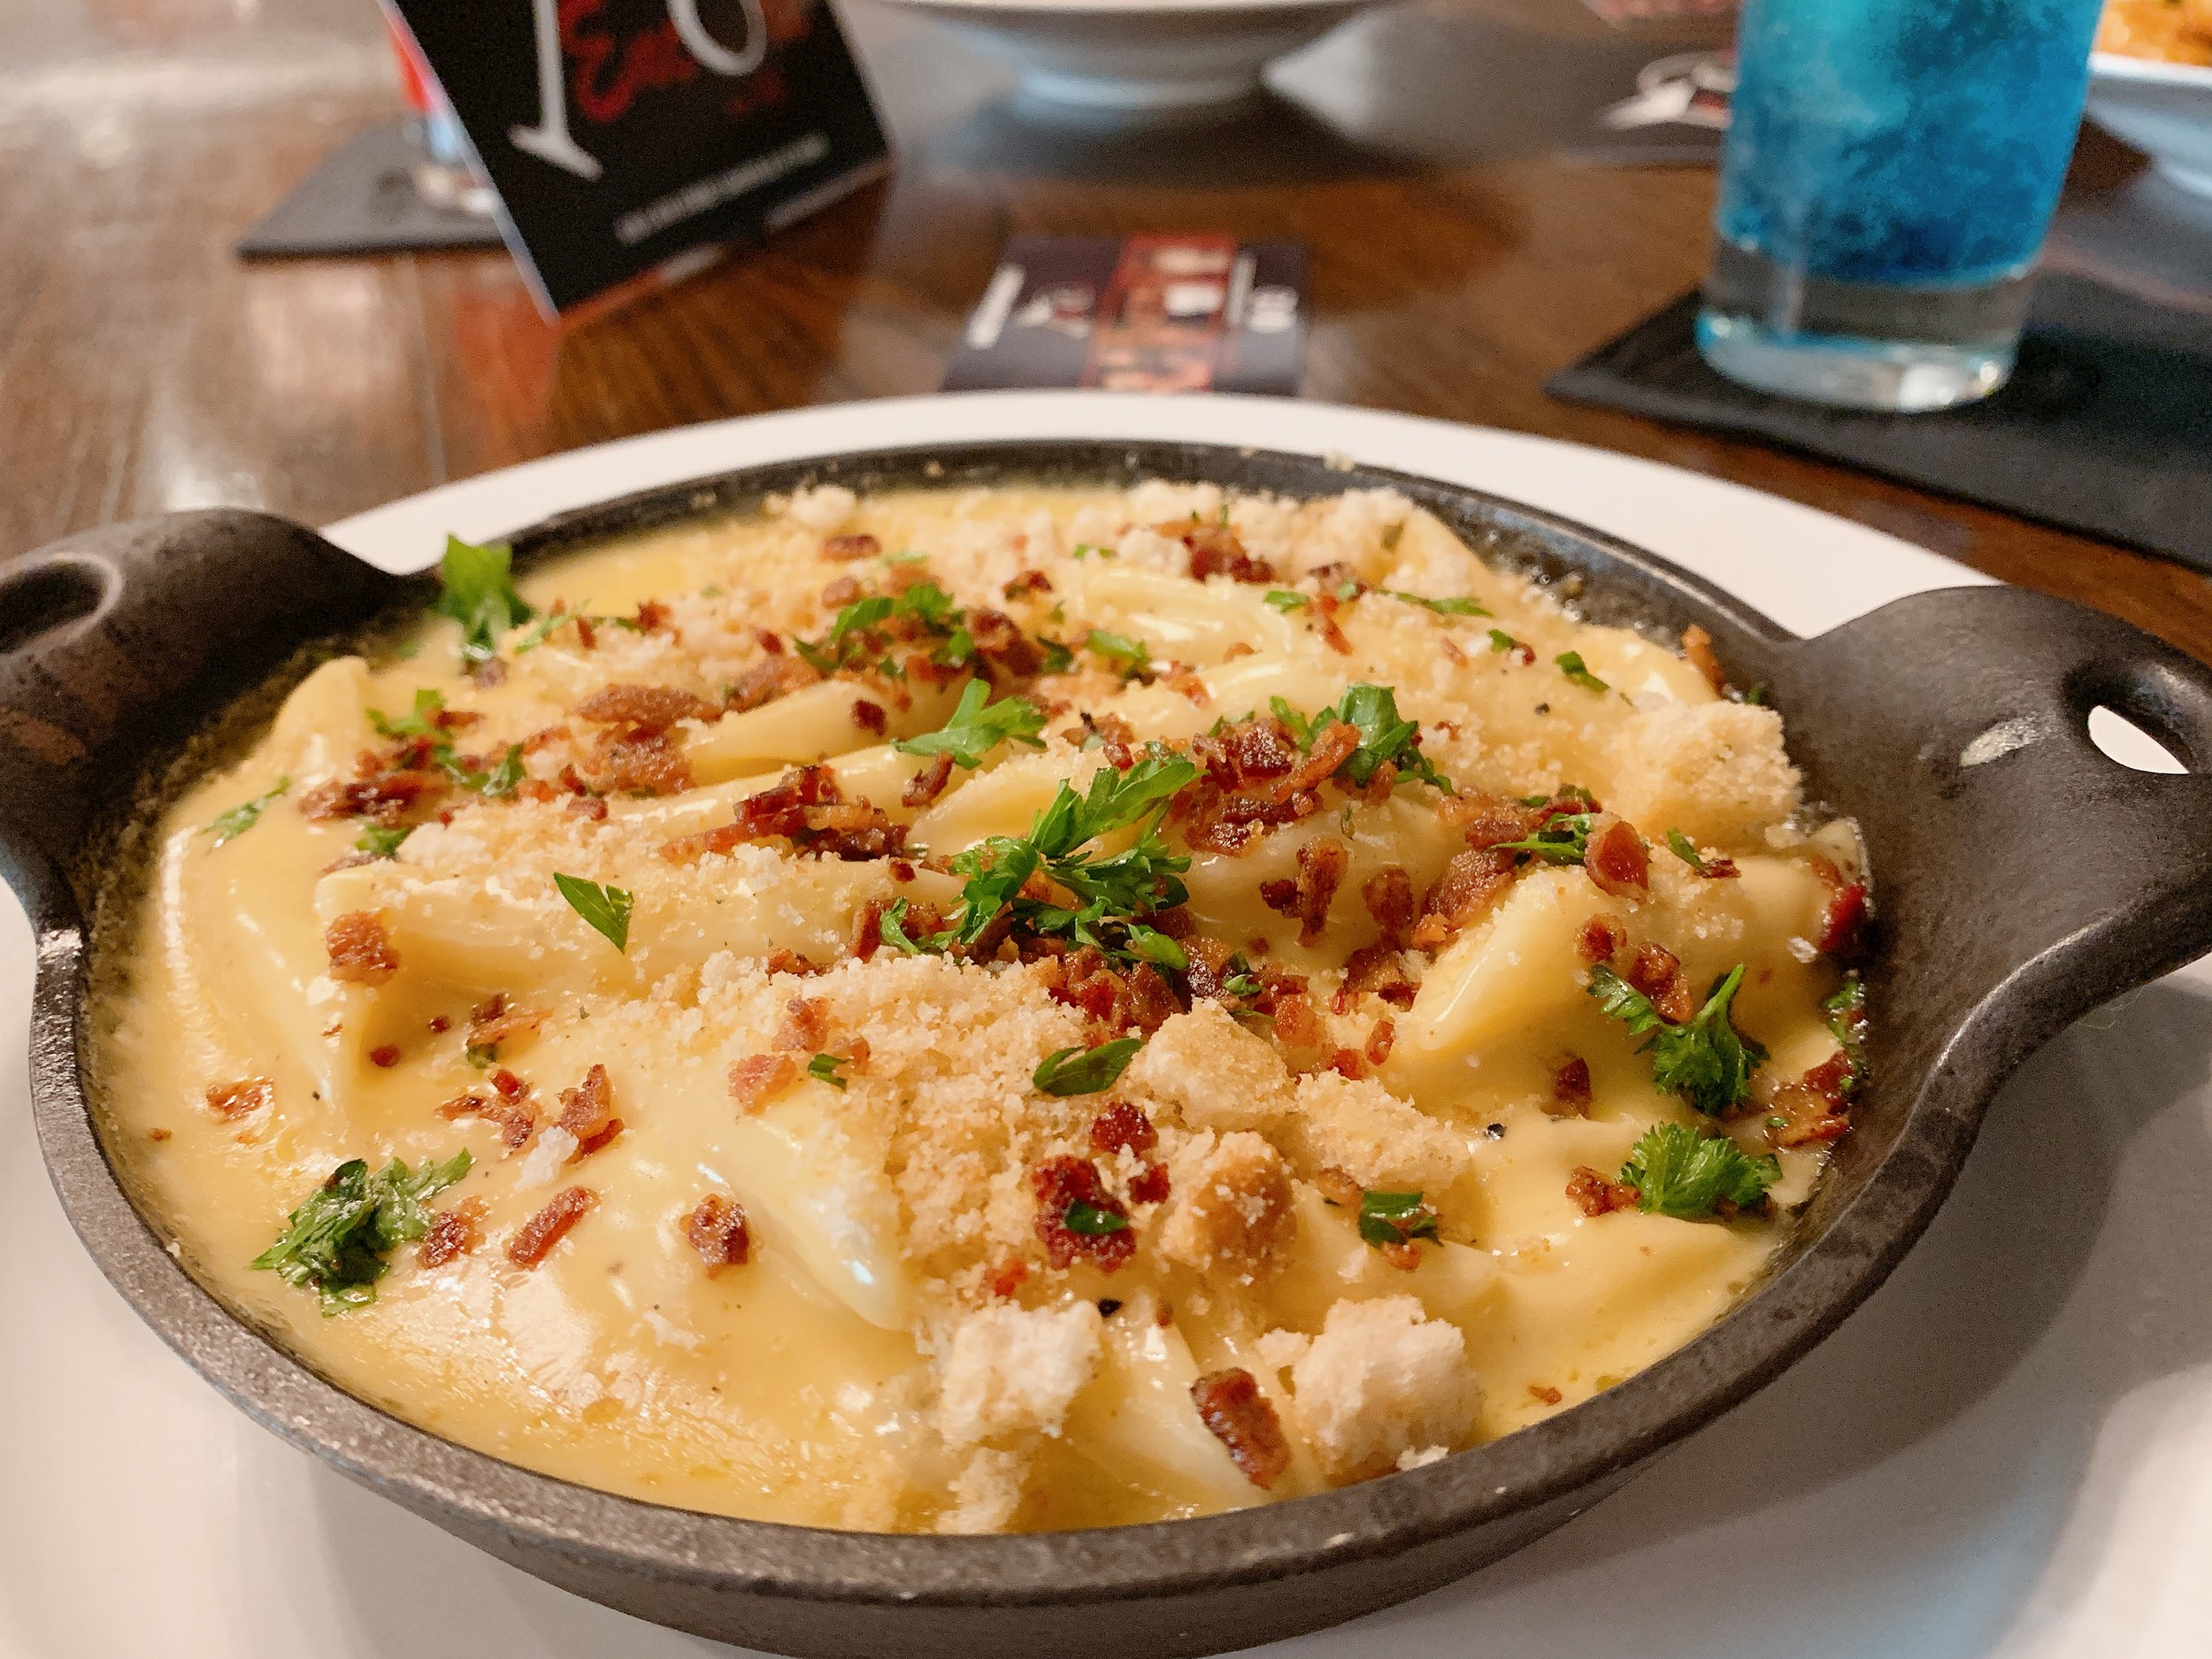 Chefprat's Skillet Mac & Cheese